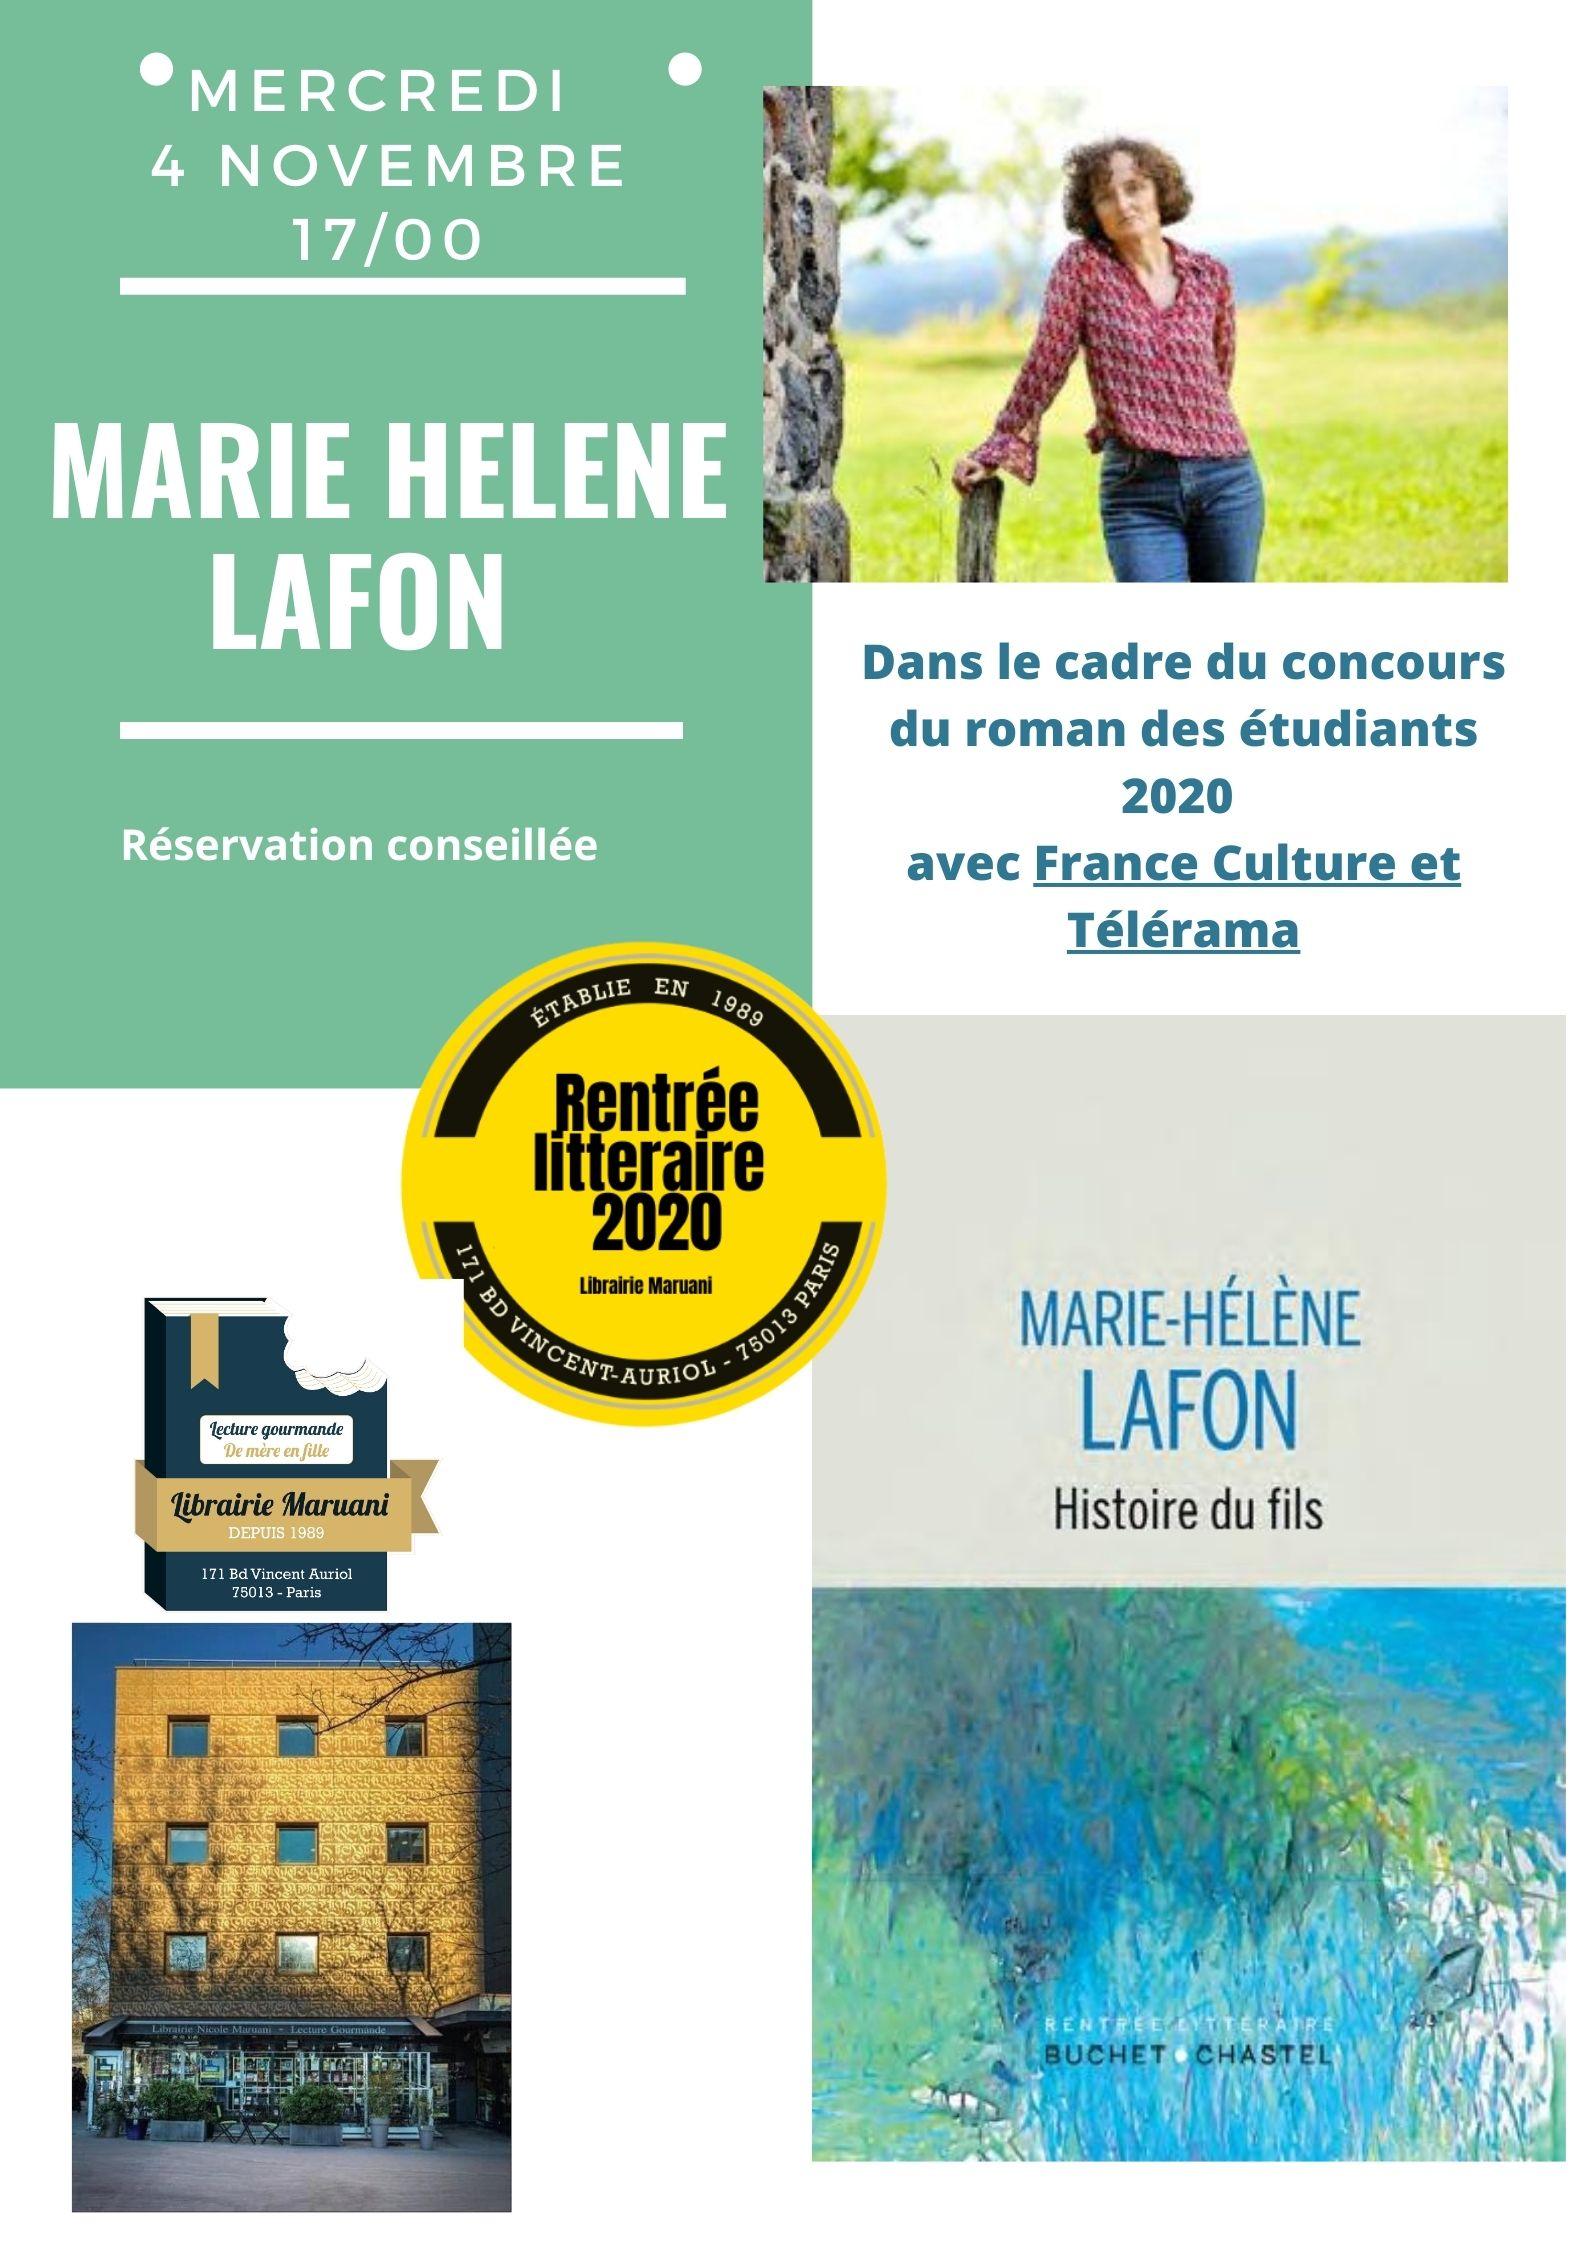 Rencontre Marie-Helene Lafon